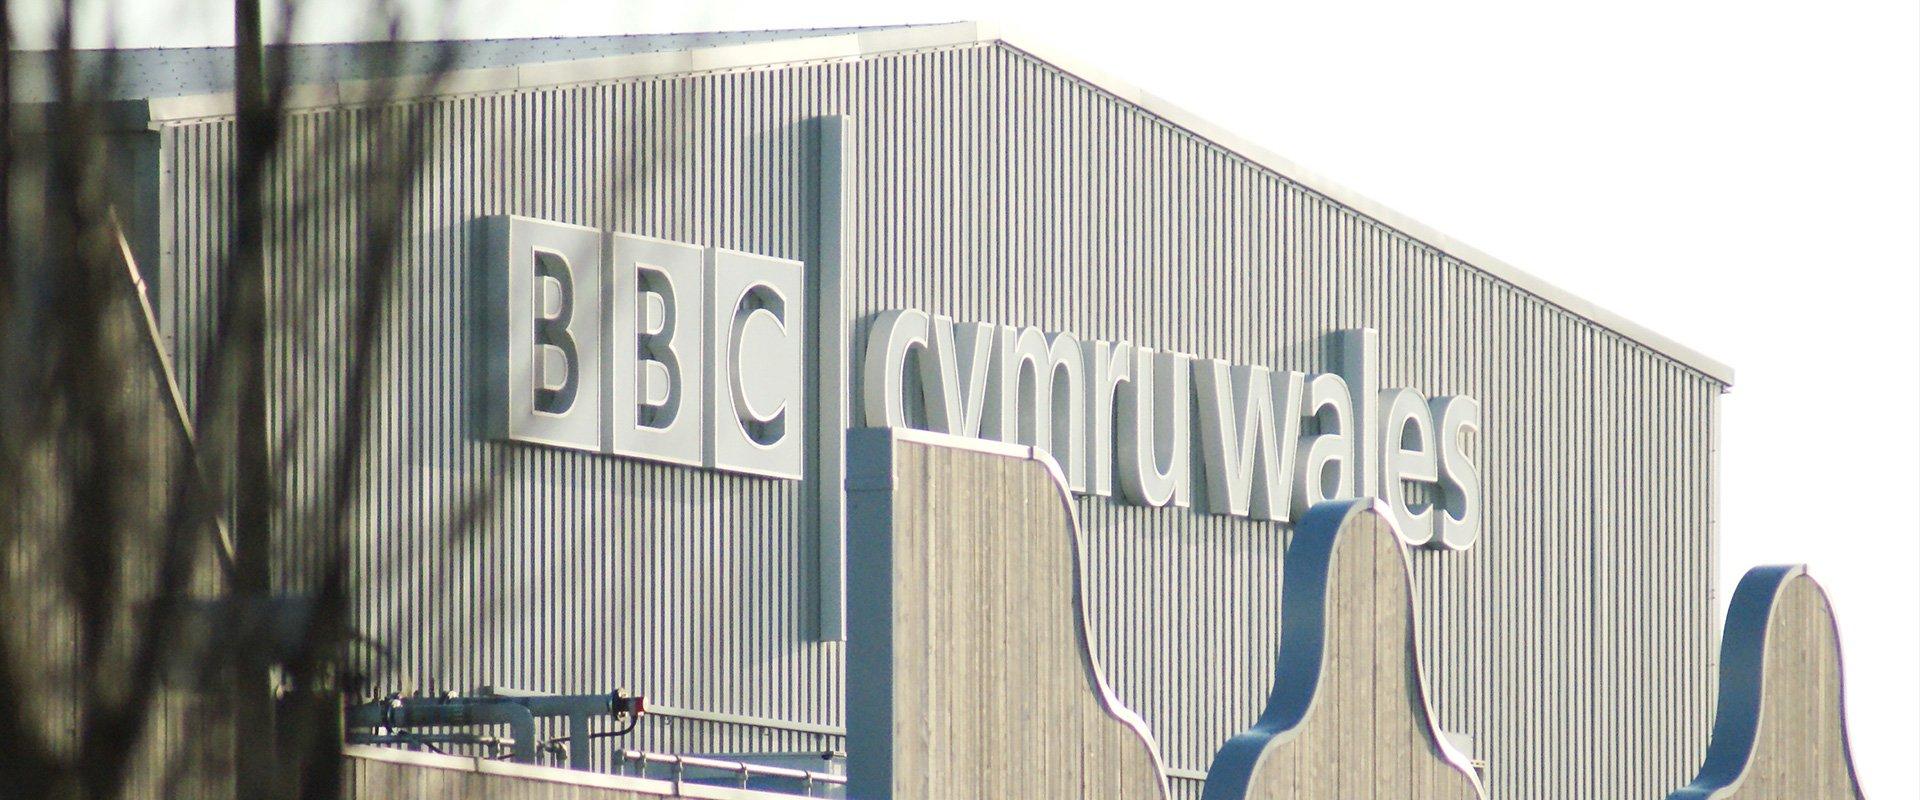 BBC studio external building signage branding